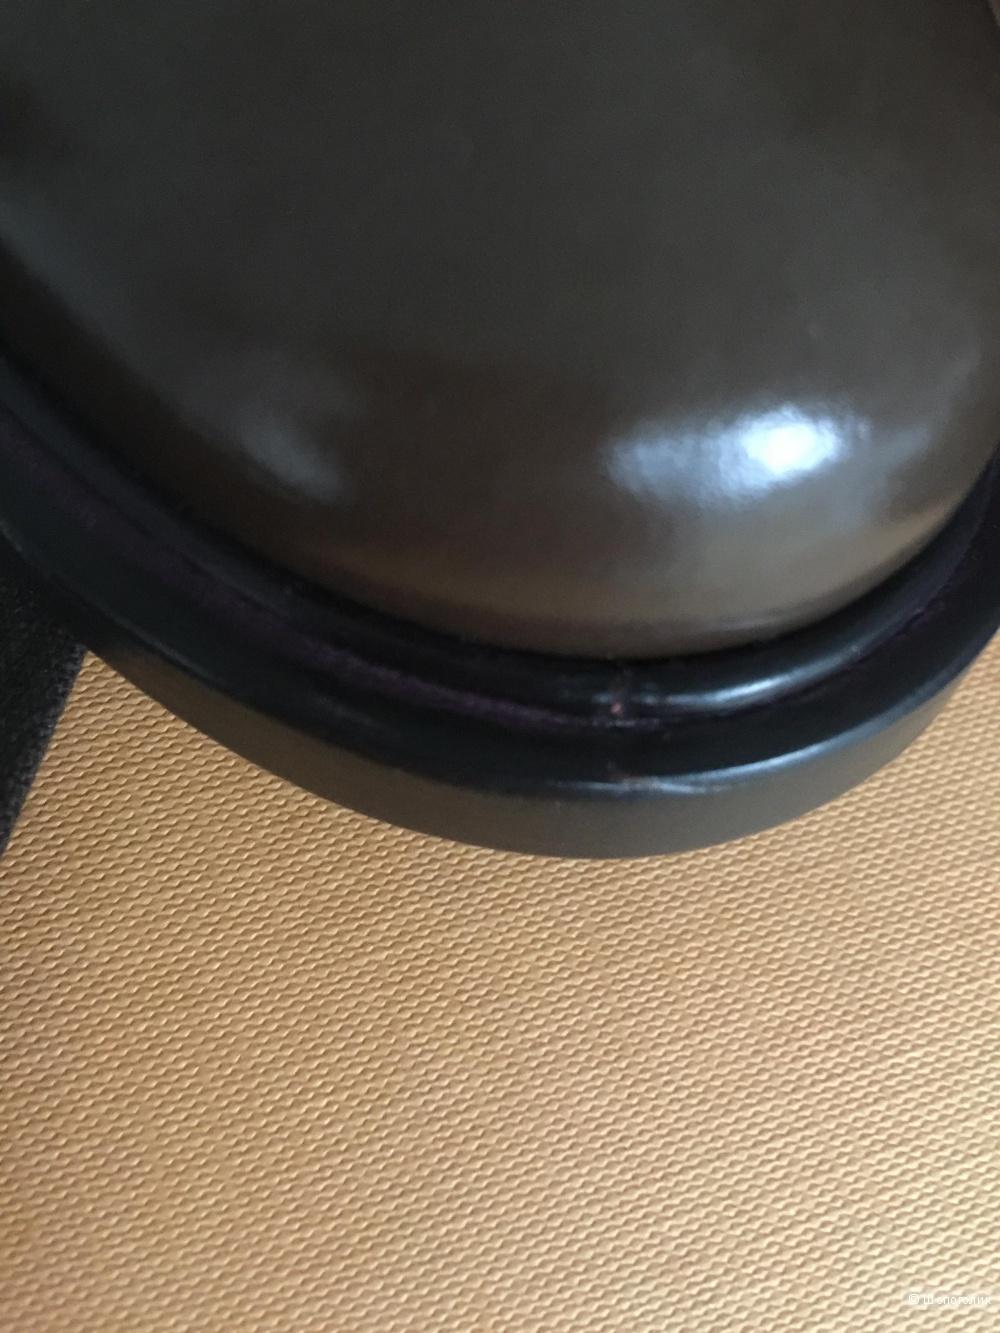 Ботинки челси TOD'S. Размер 37 (европейский размер).